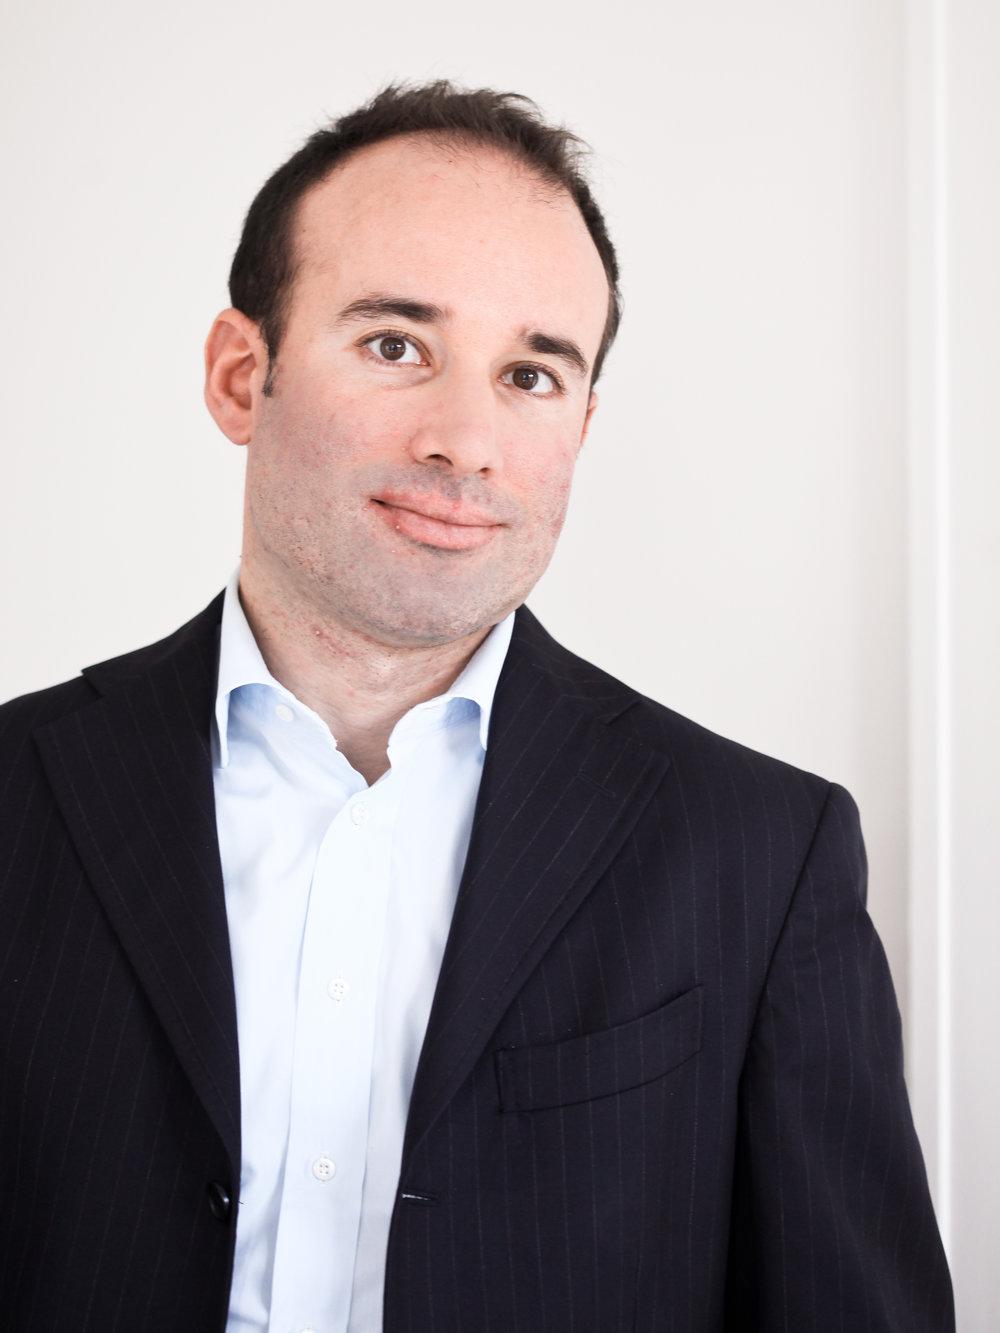 <span>Fabio Lancellotti (FR)</span><span>Aster Capital</span>